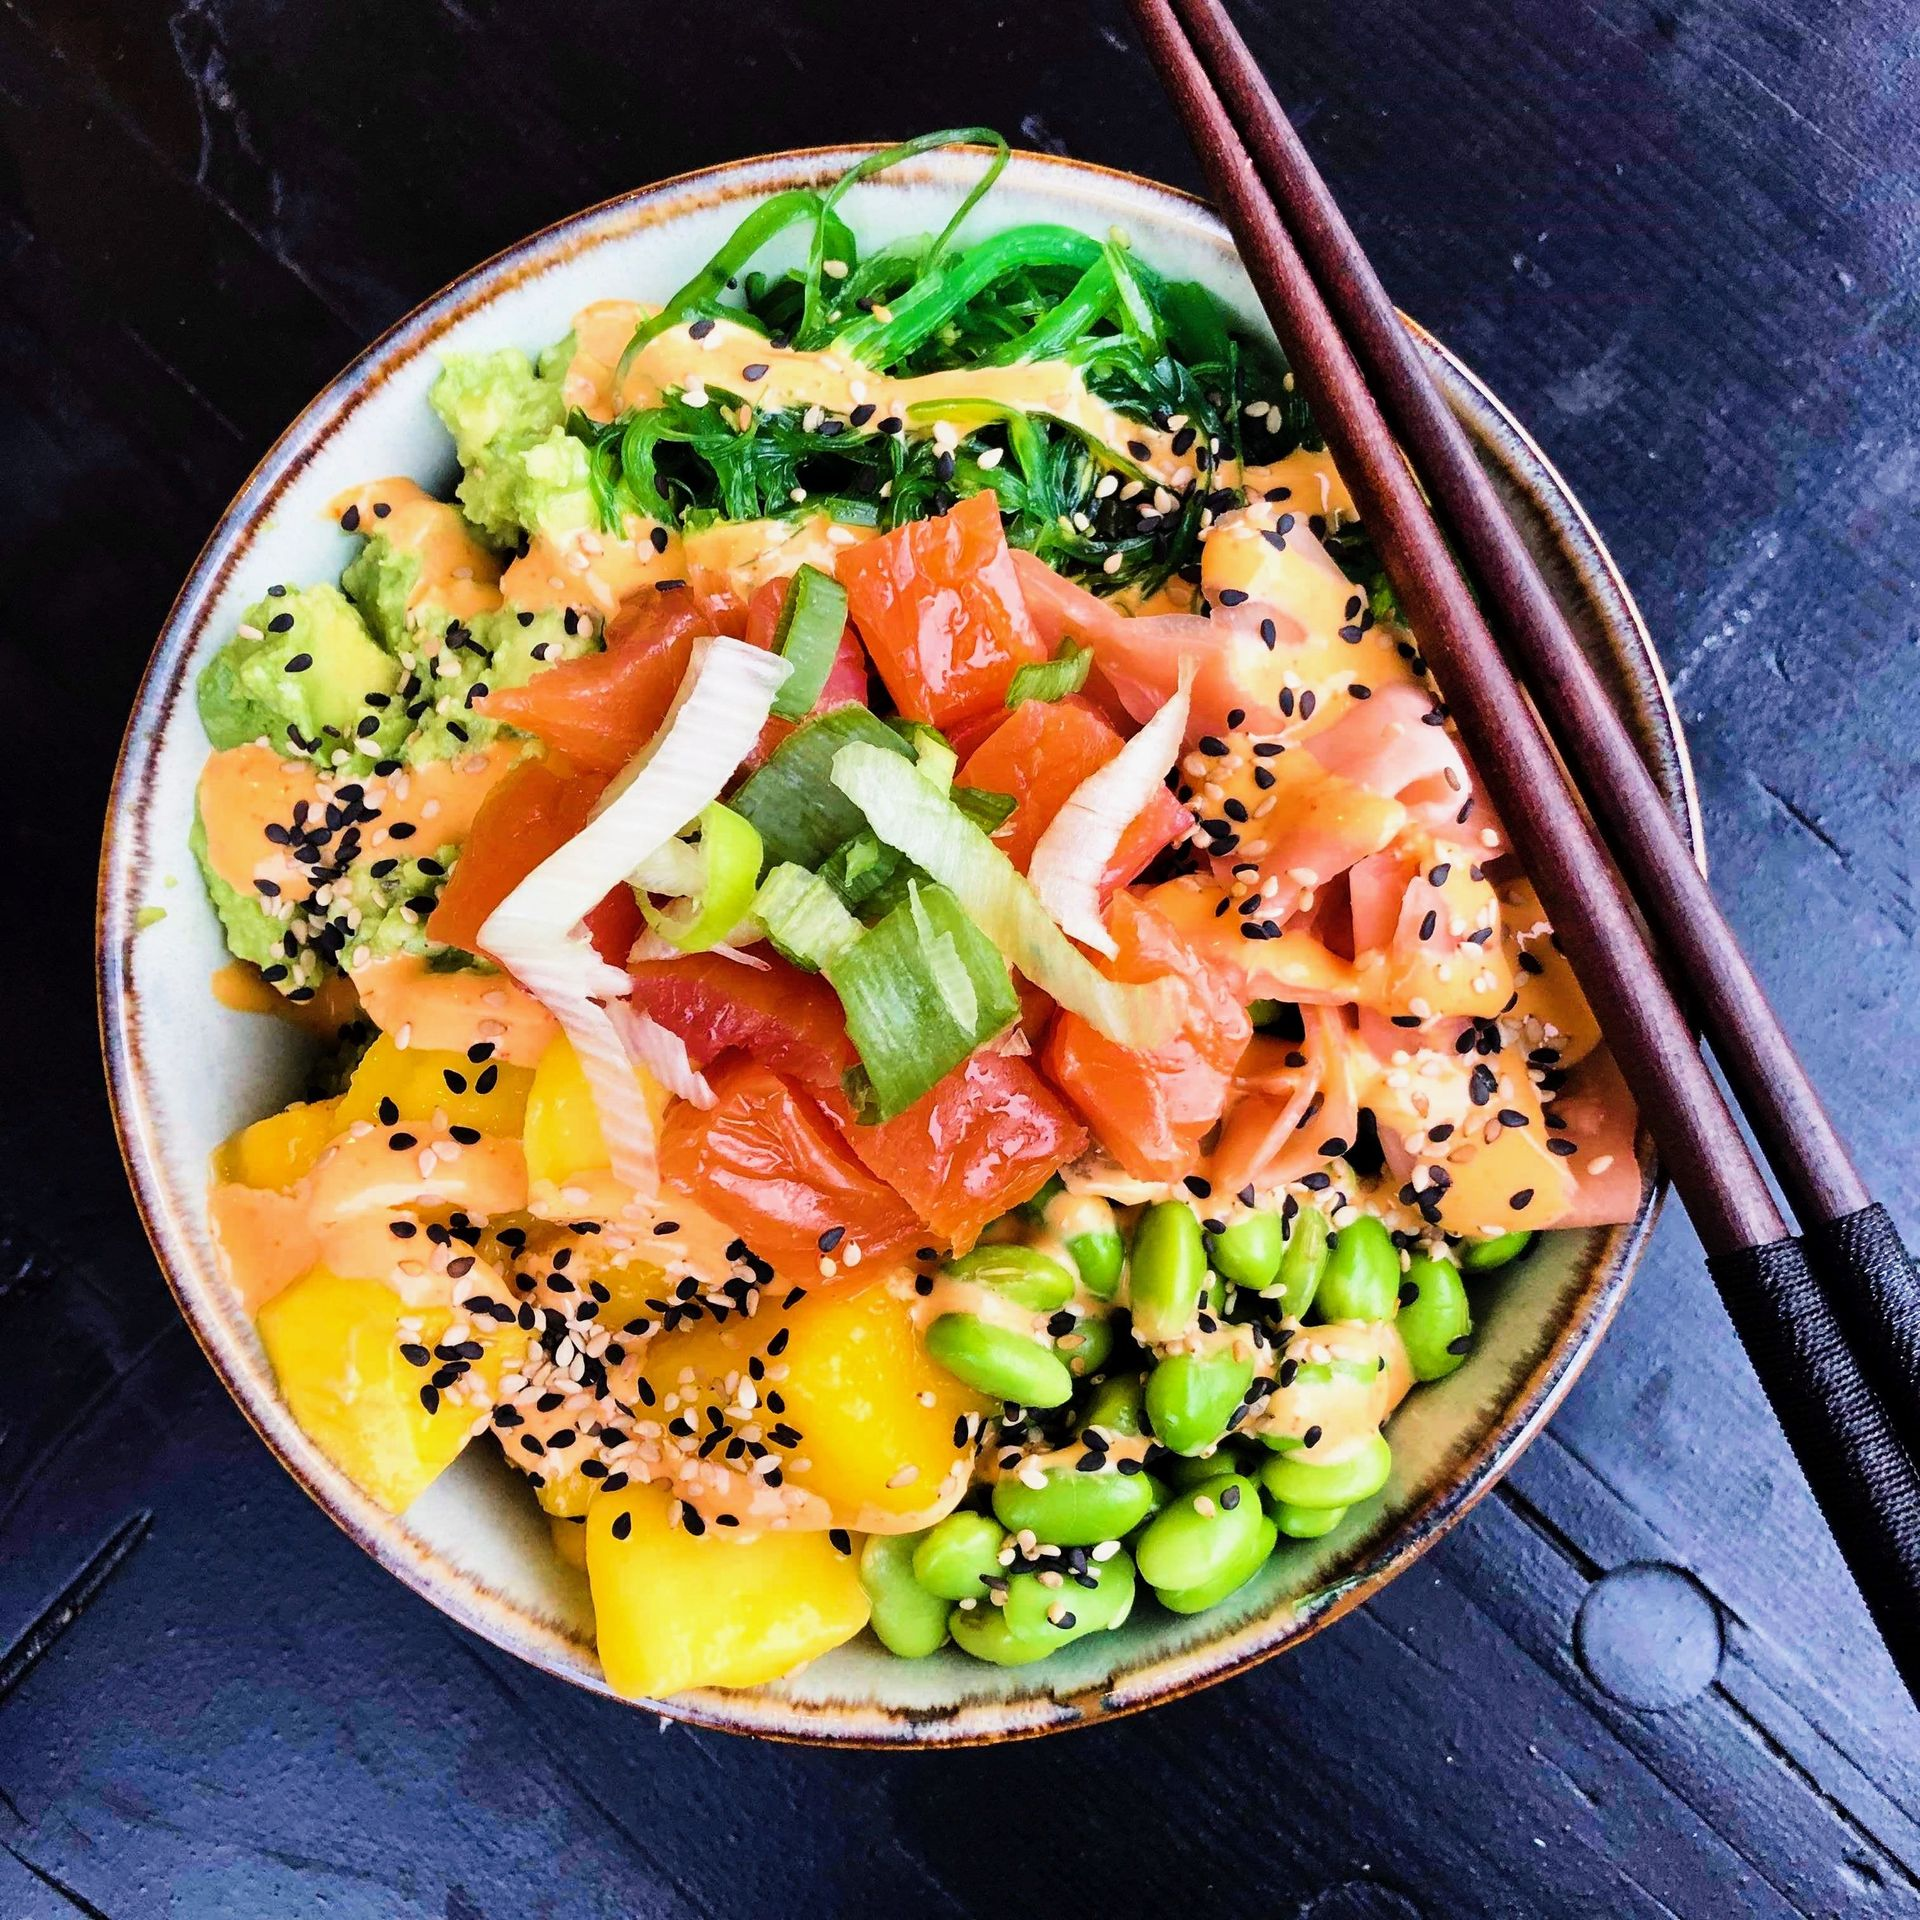 Bestelle bei GREEN PANDA - Green Panda | hungrig